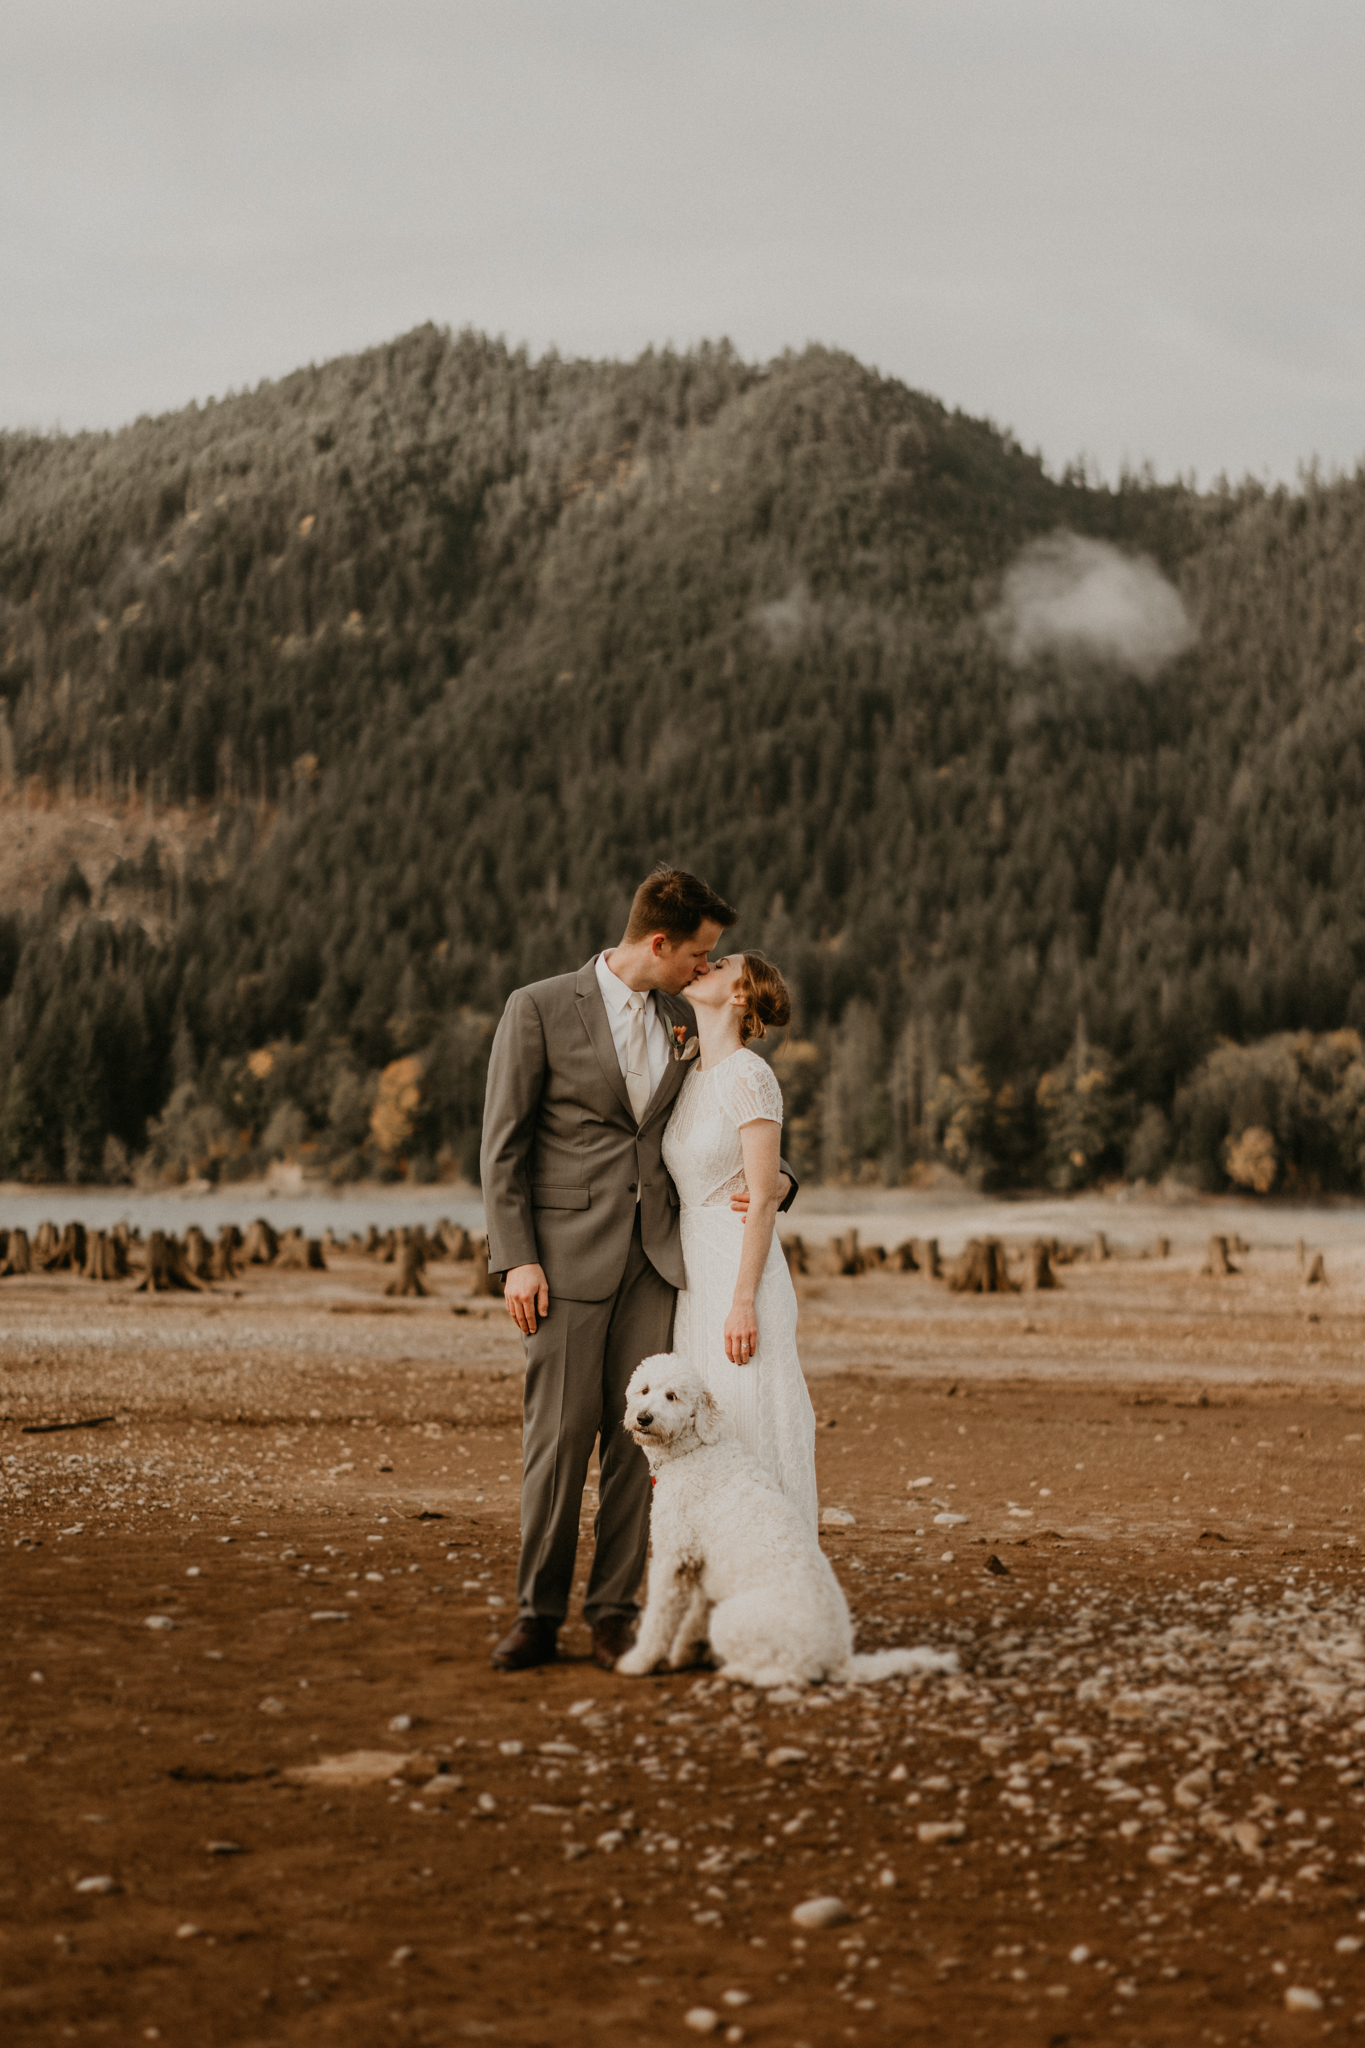 Lake-Cushman-Wedding-Elopement-Engagement-Seattle-Washington-PNW-Adventure-Nature-Photographer-13.jpg